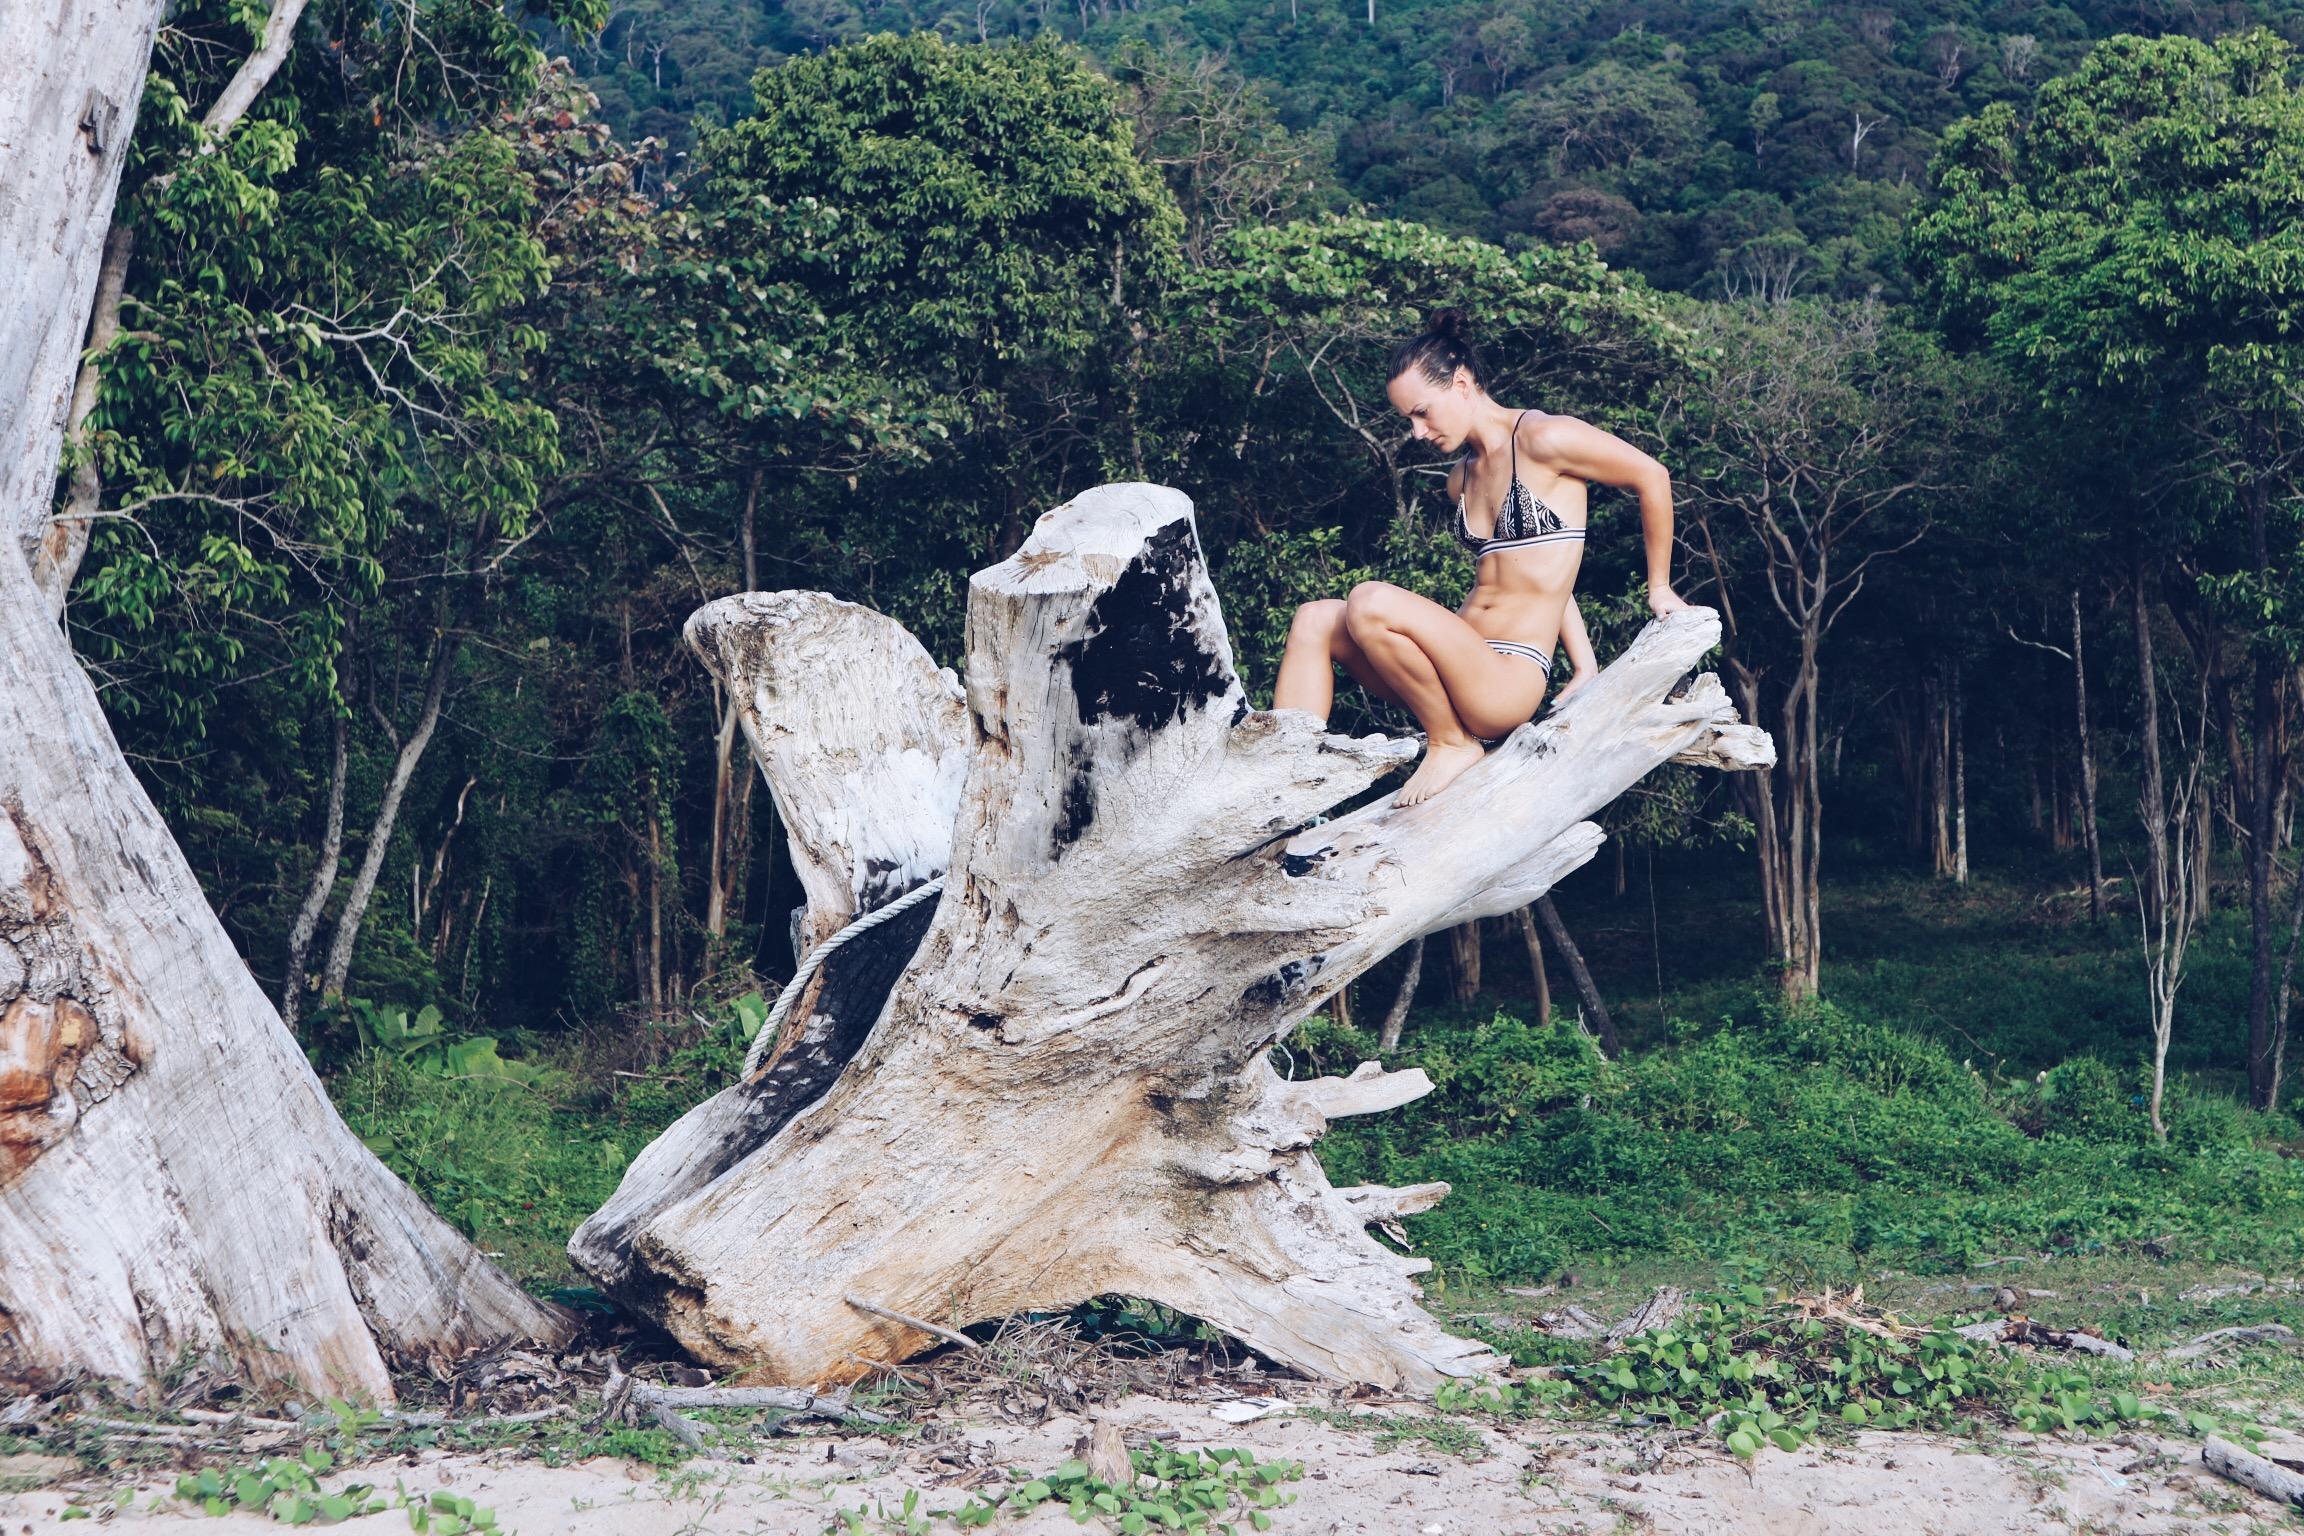 xmariekie, blog, blogger, influencer, te dik, te dun, dik, dun, afvallen, aankomen, dieet, fitness, krachttraining, wereldreis, reizen, sporten